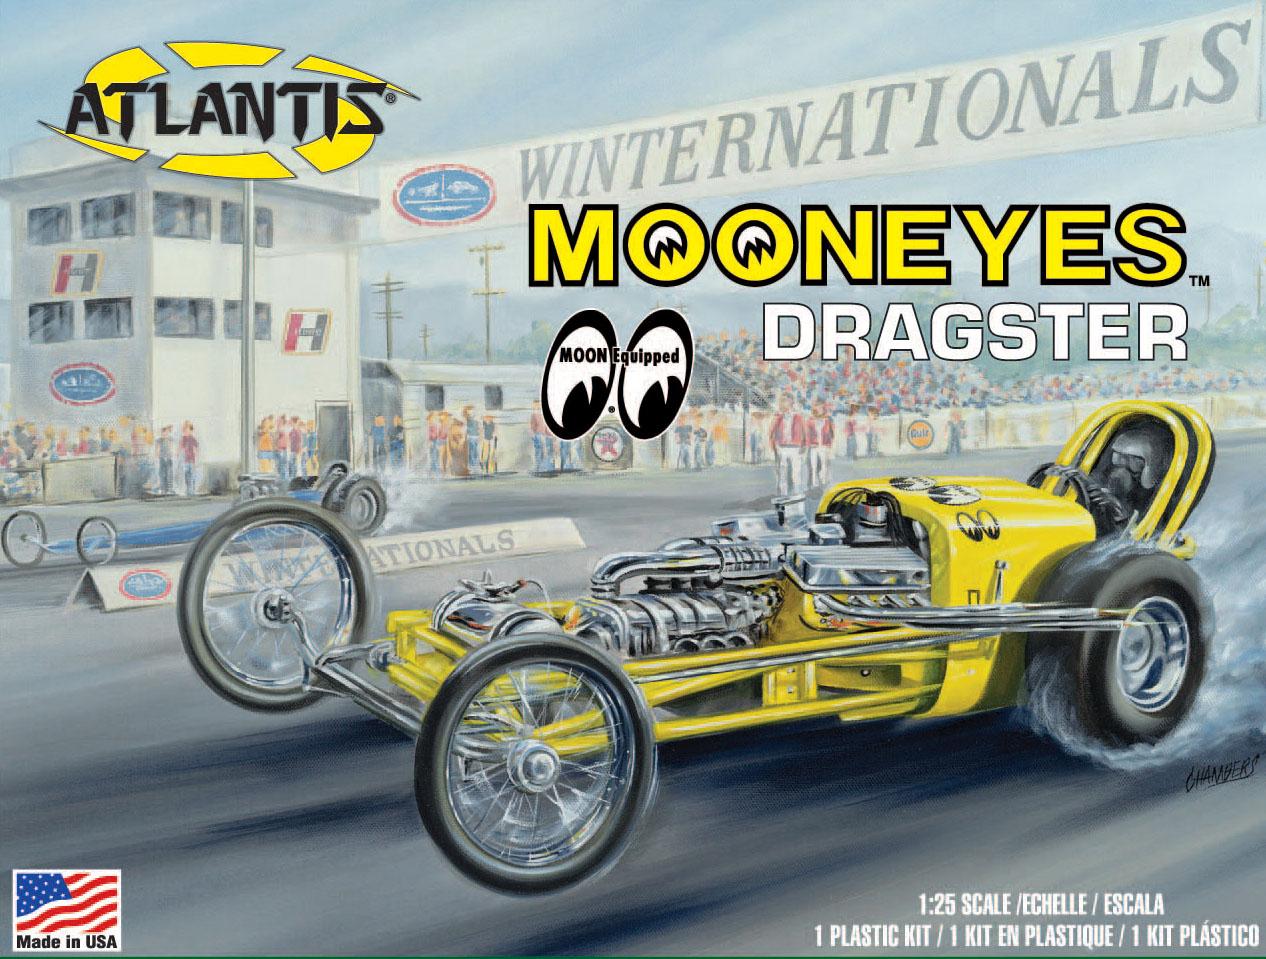 Atlantis 1/25 Mooneyes Dragster